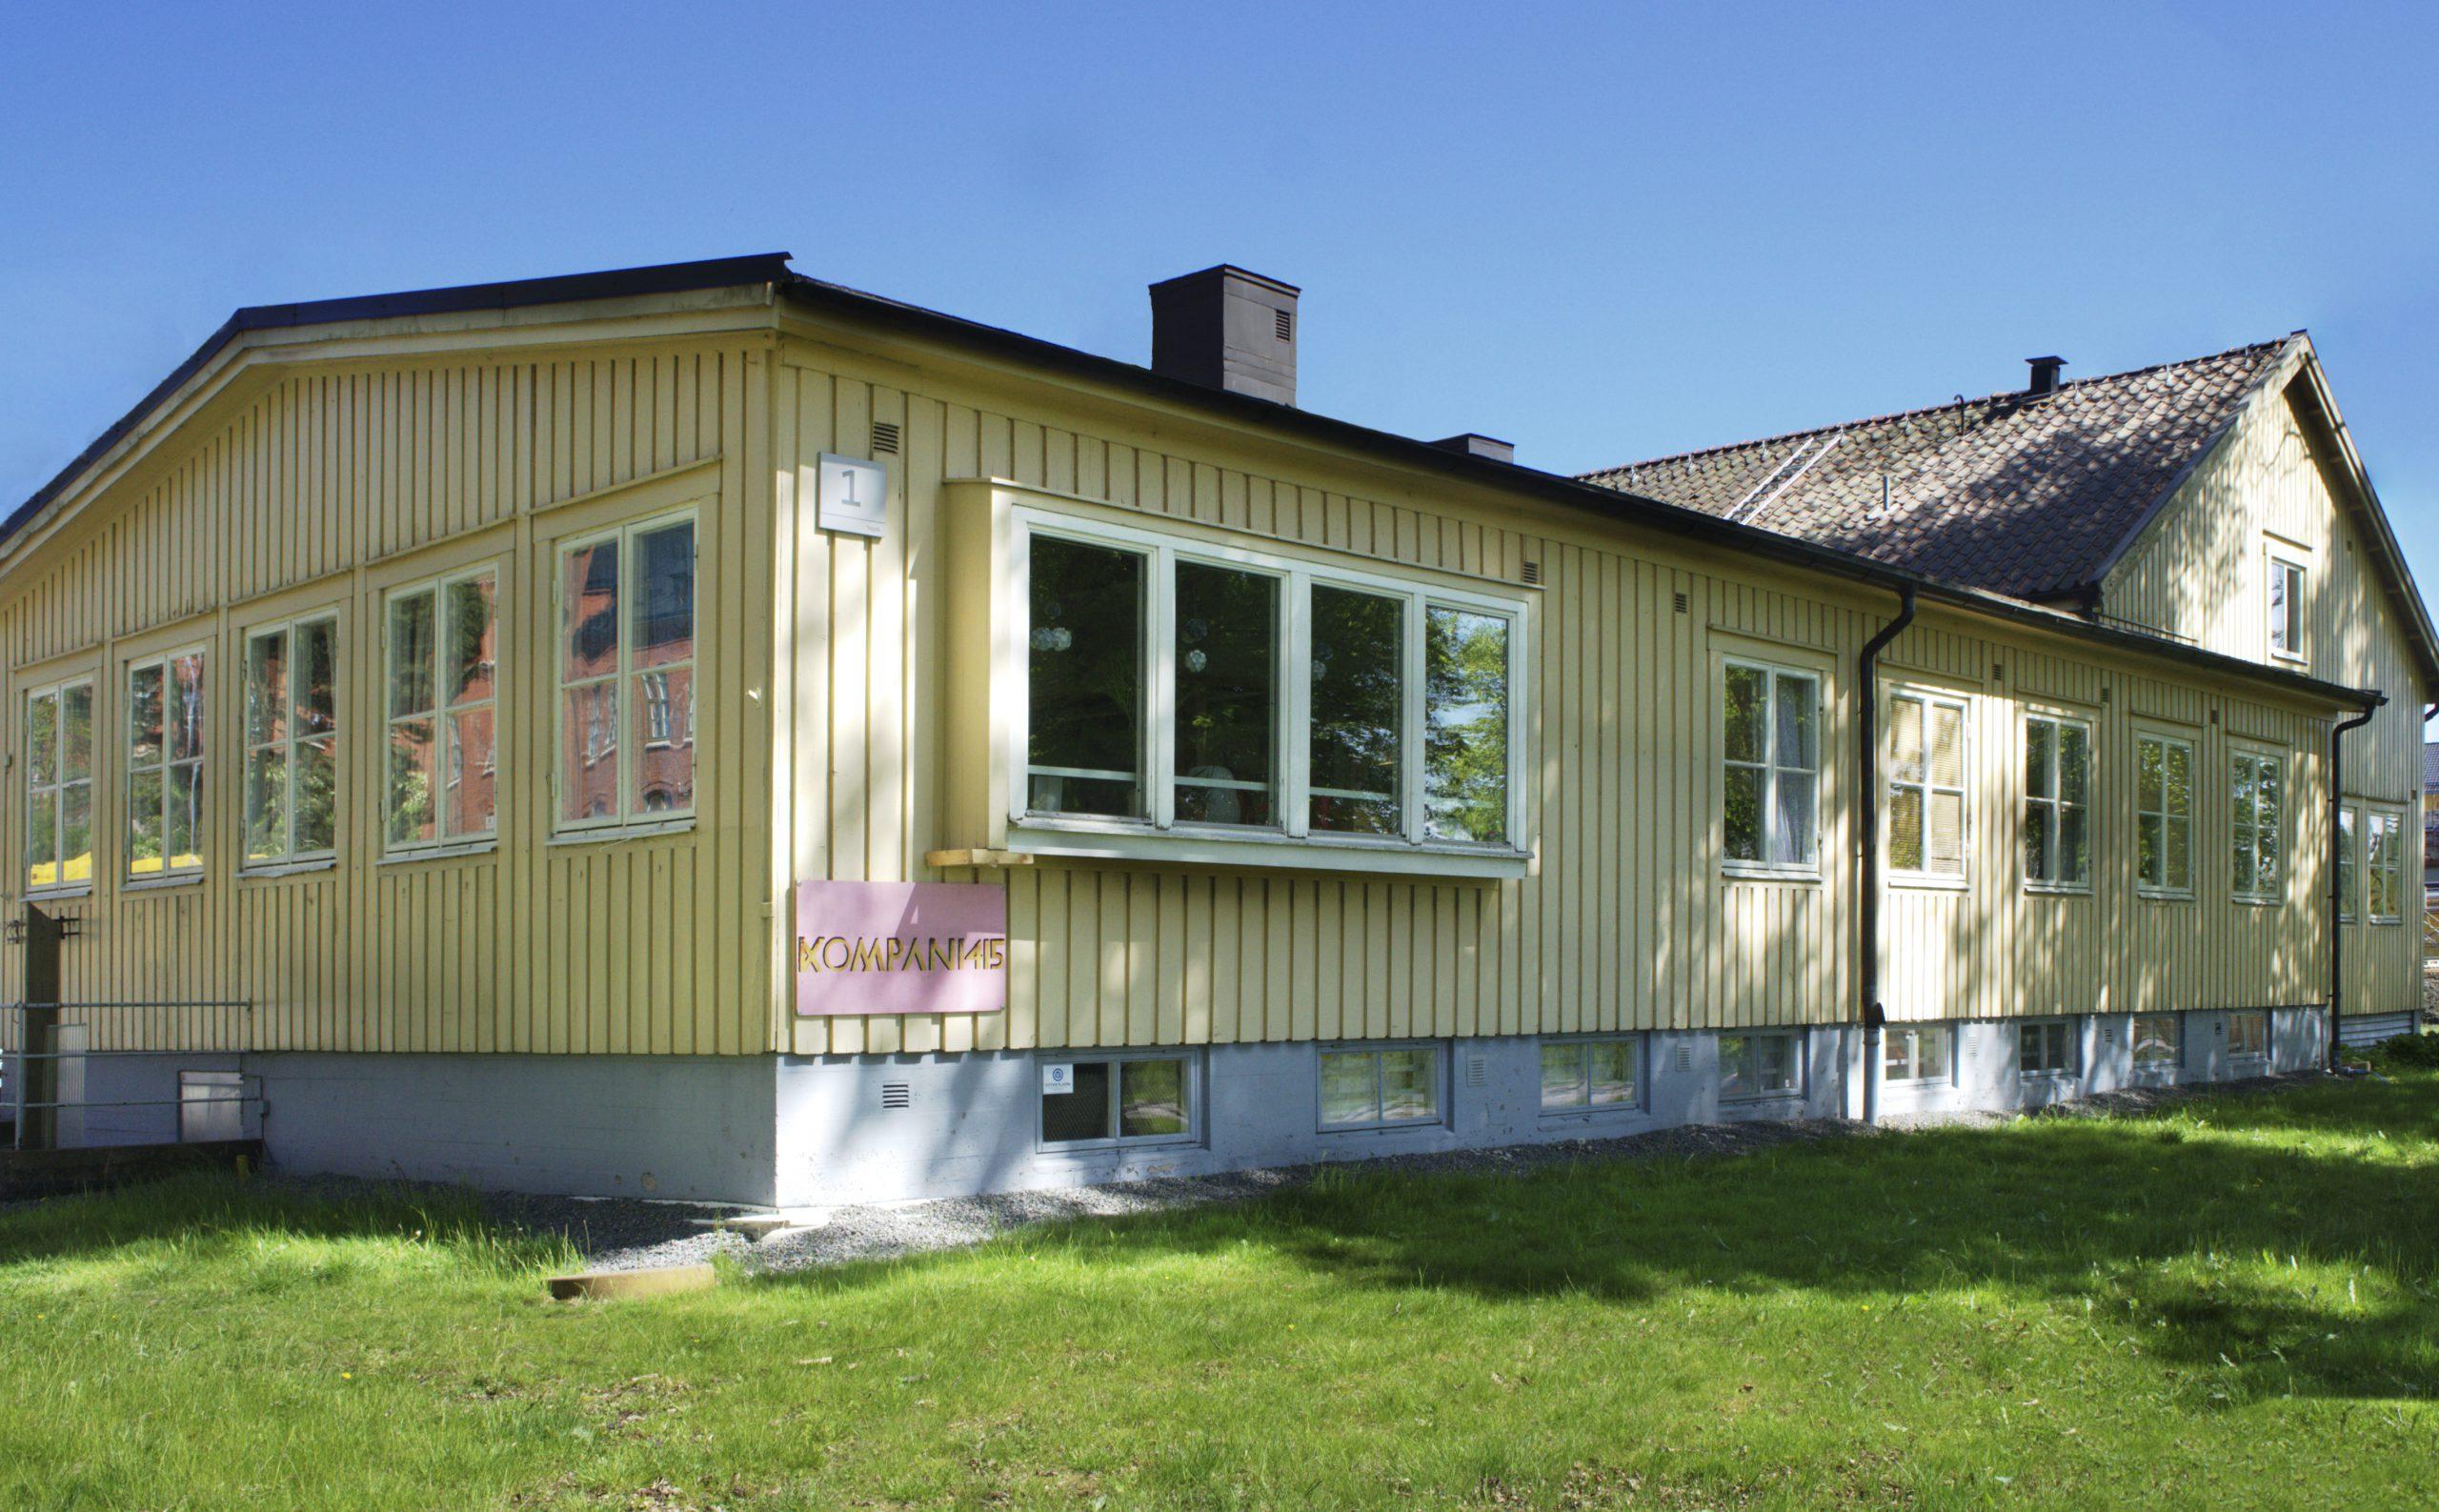 Utsidan av Kompani 415 i Kviberg